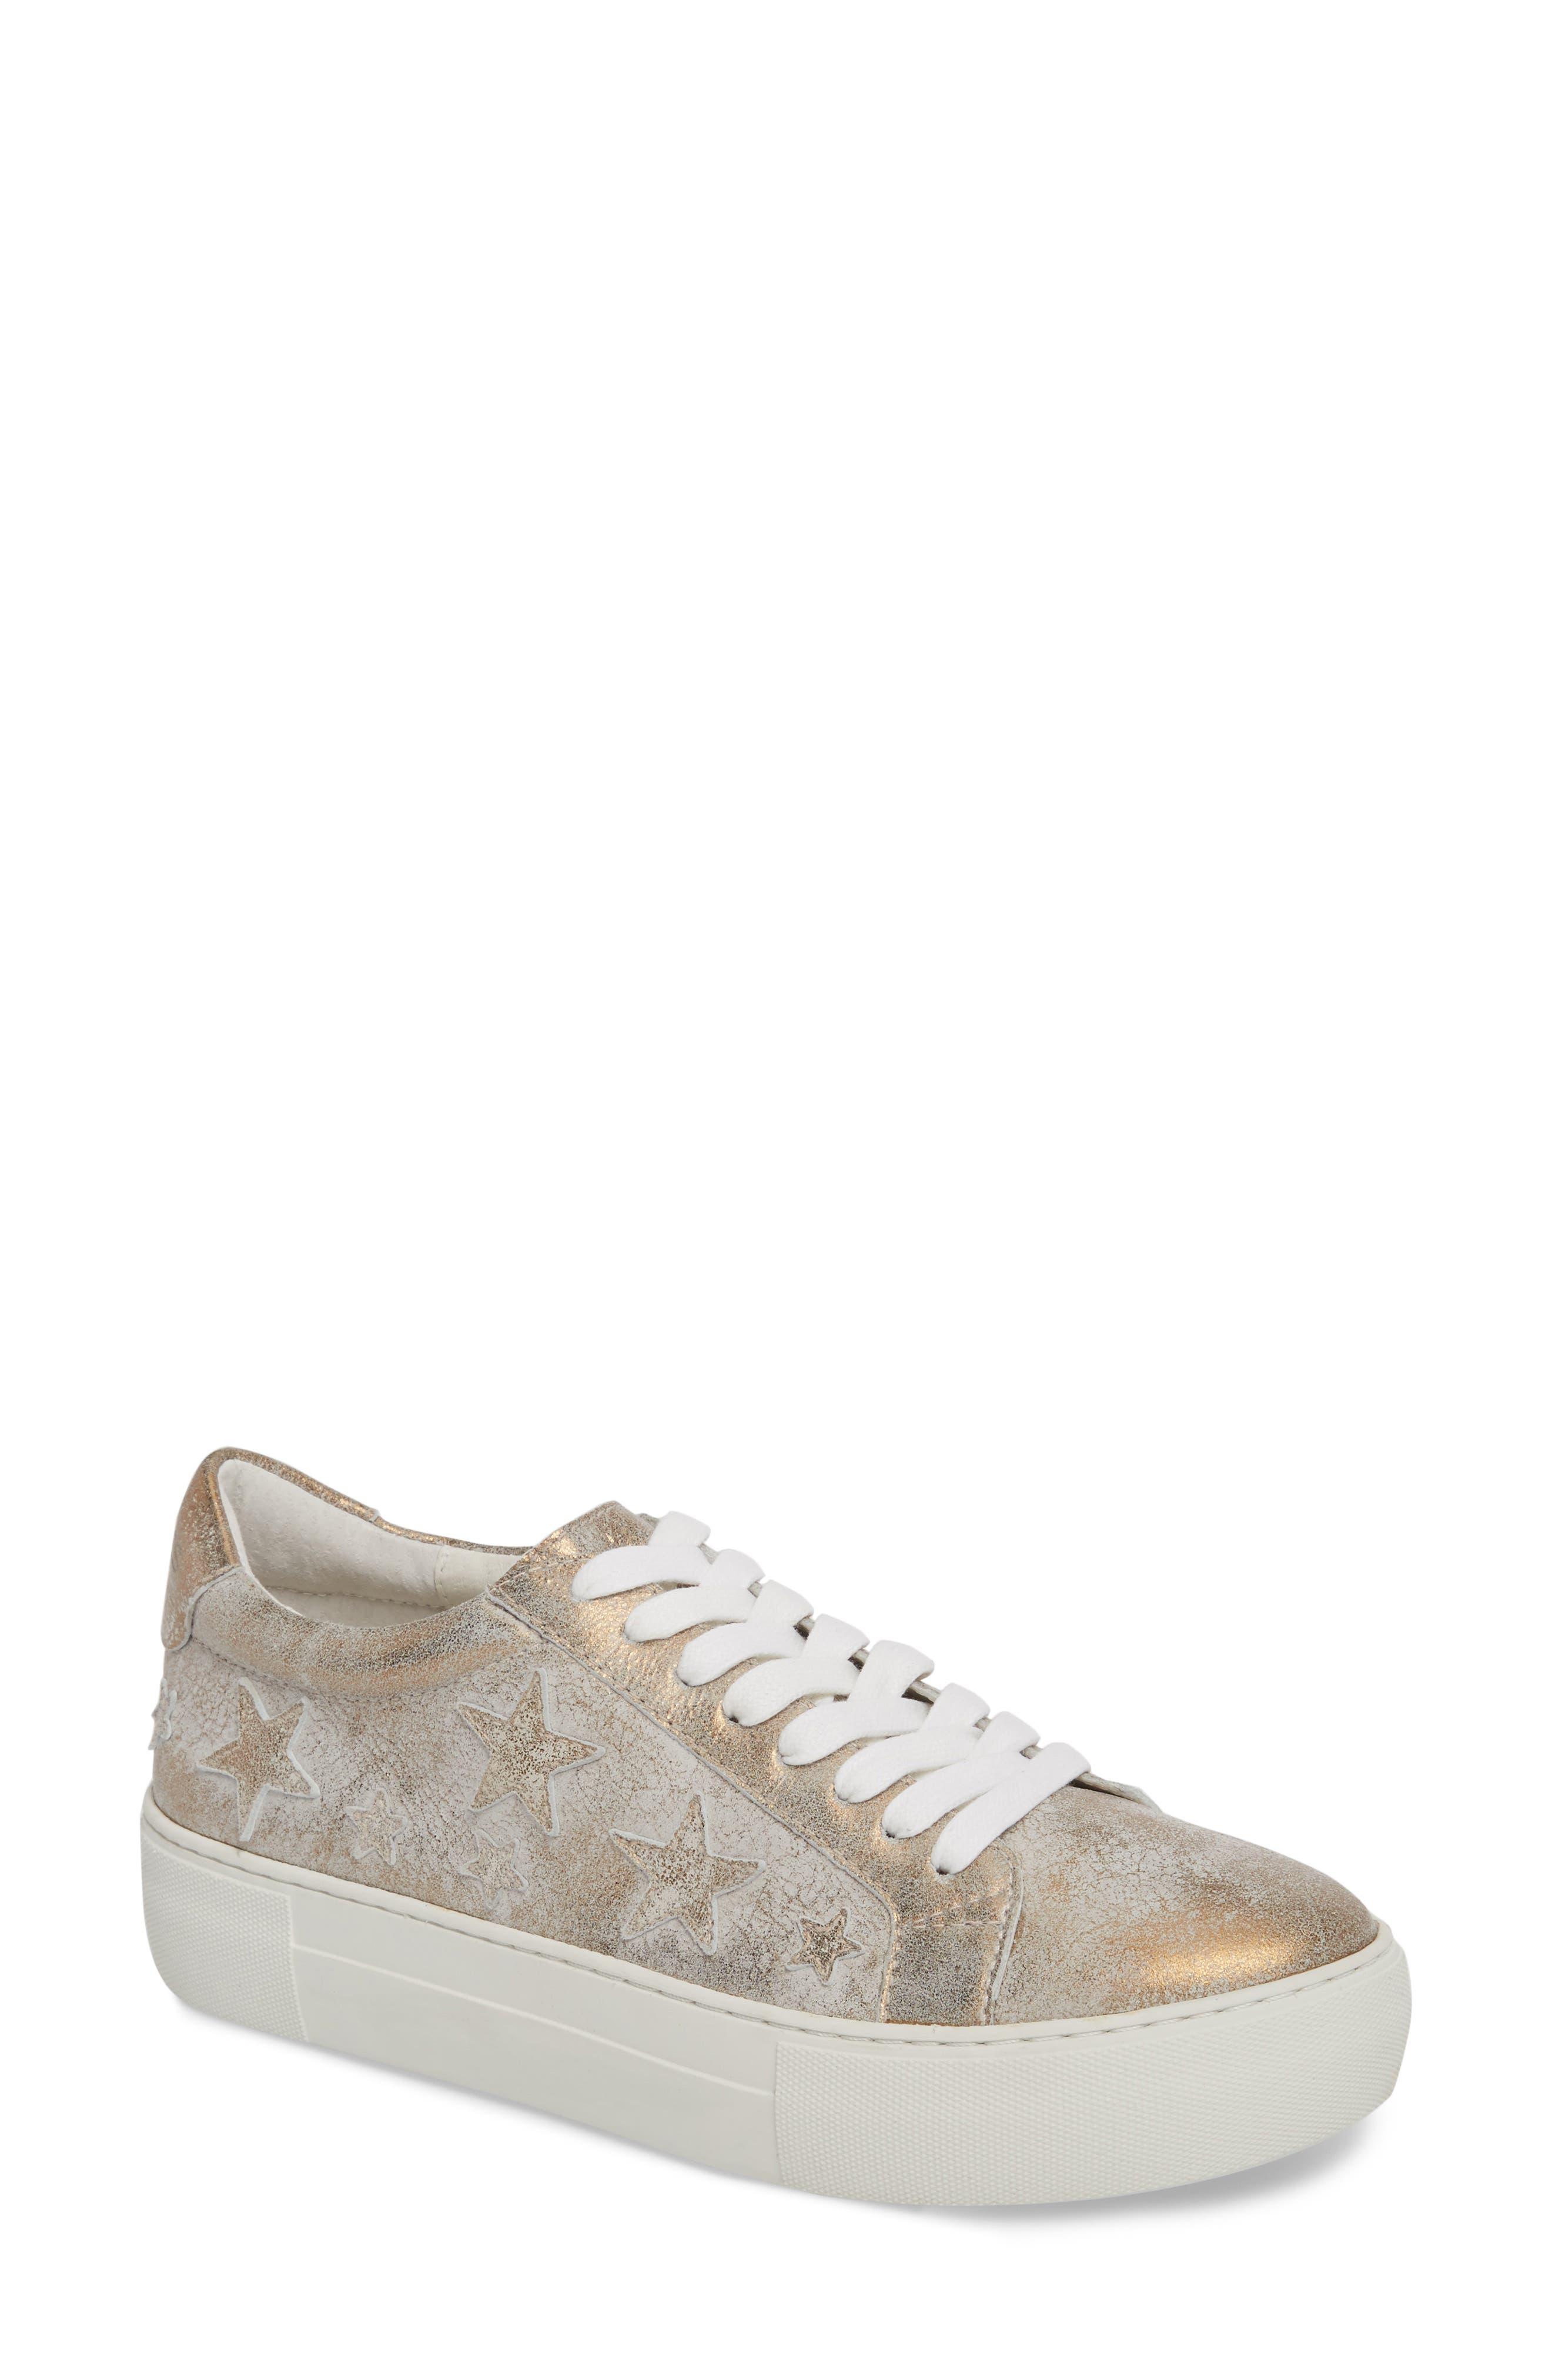 Apostle Sneaker,                             Main thumbnail 1, color,                             Bronze Suede